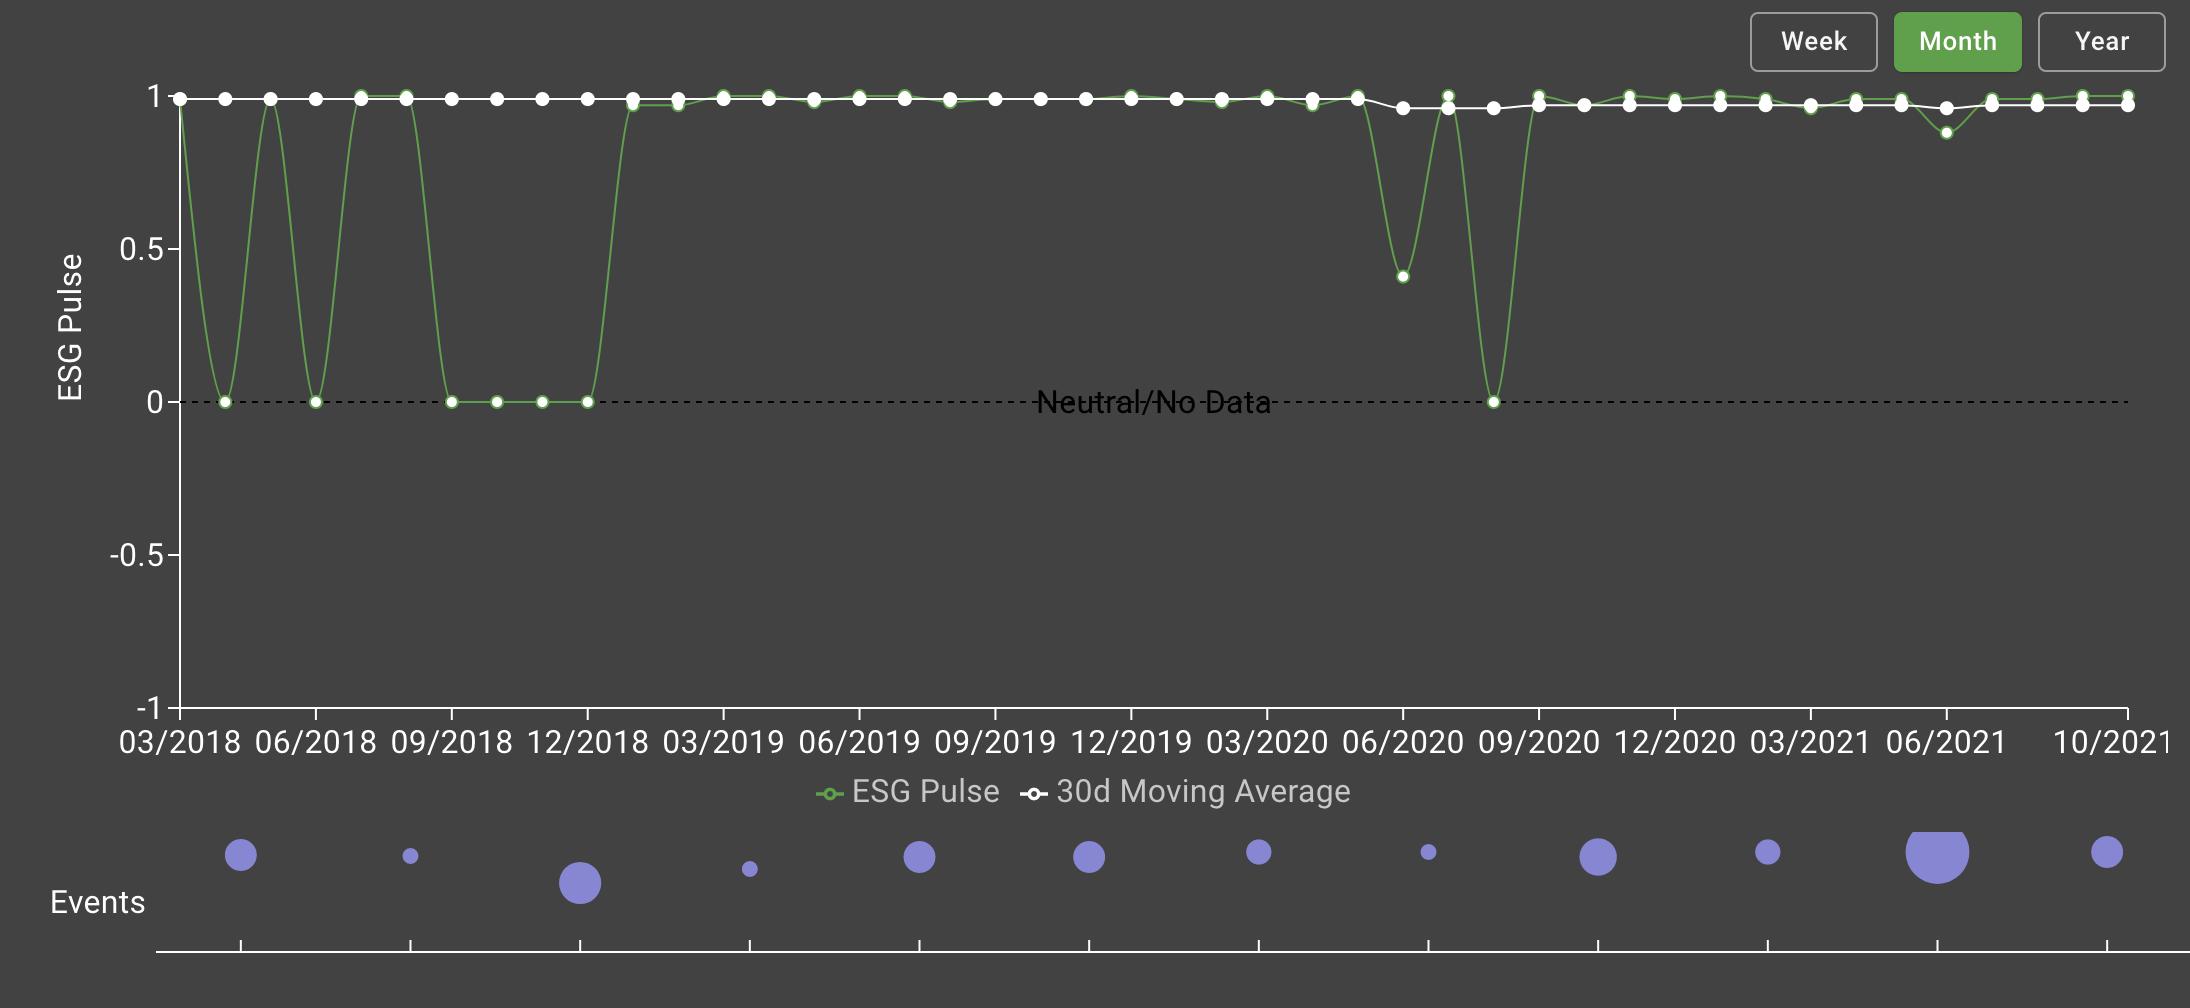 A line chart